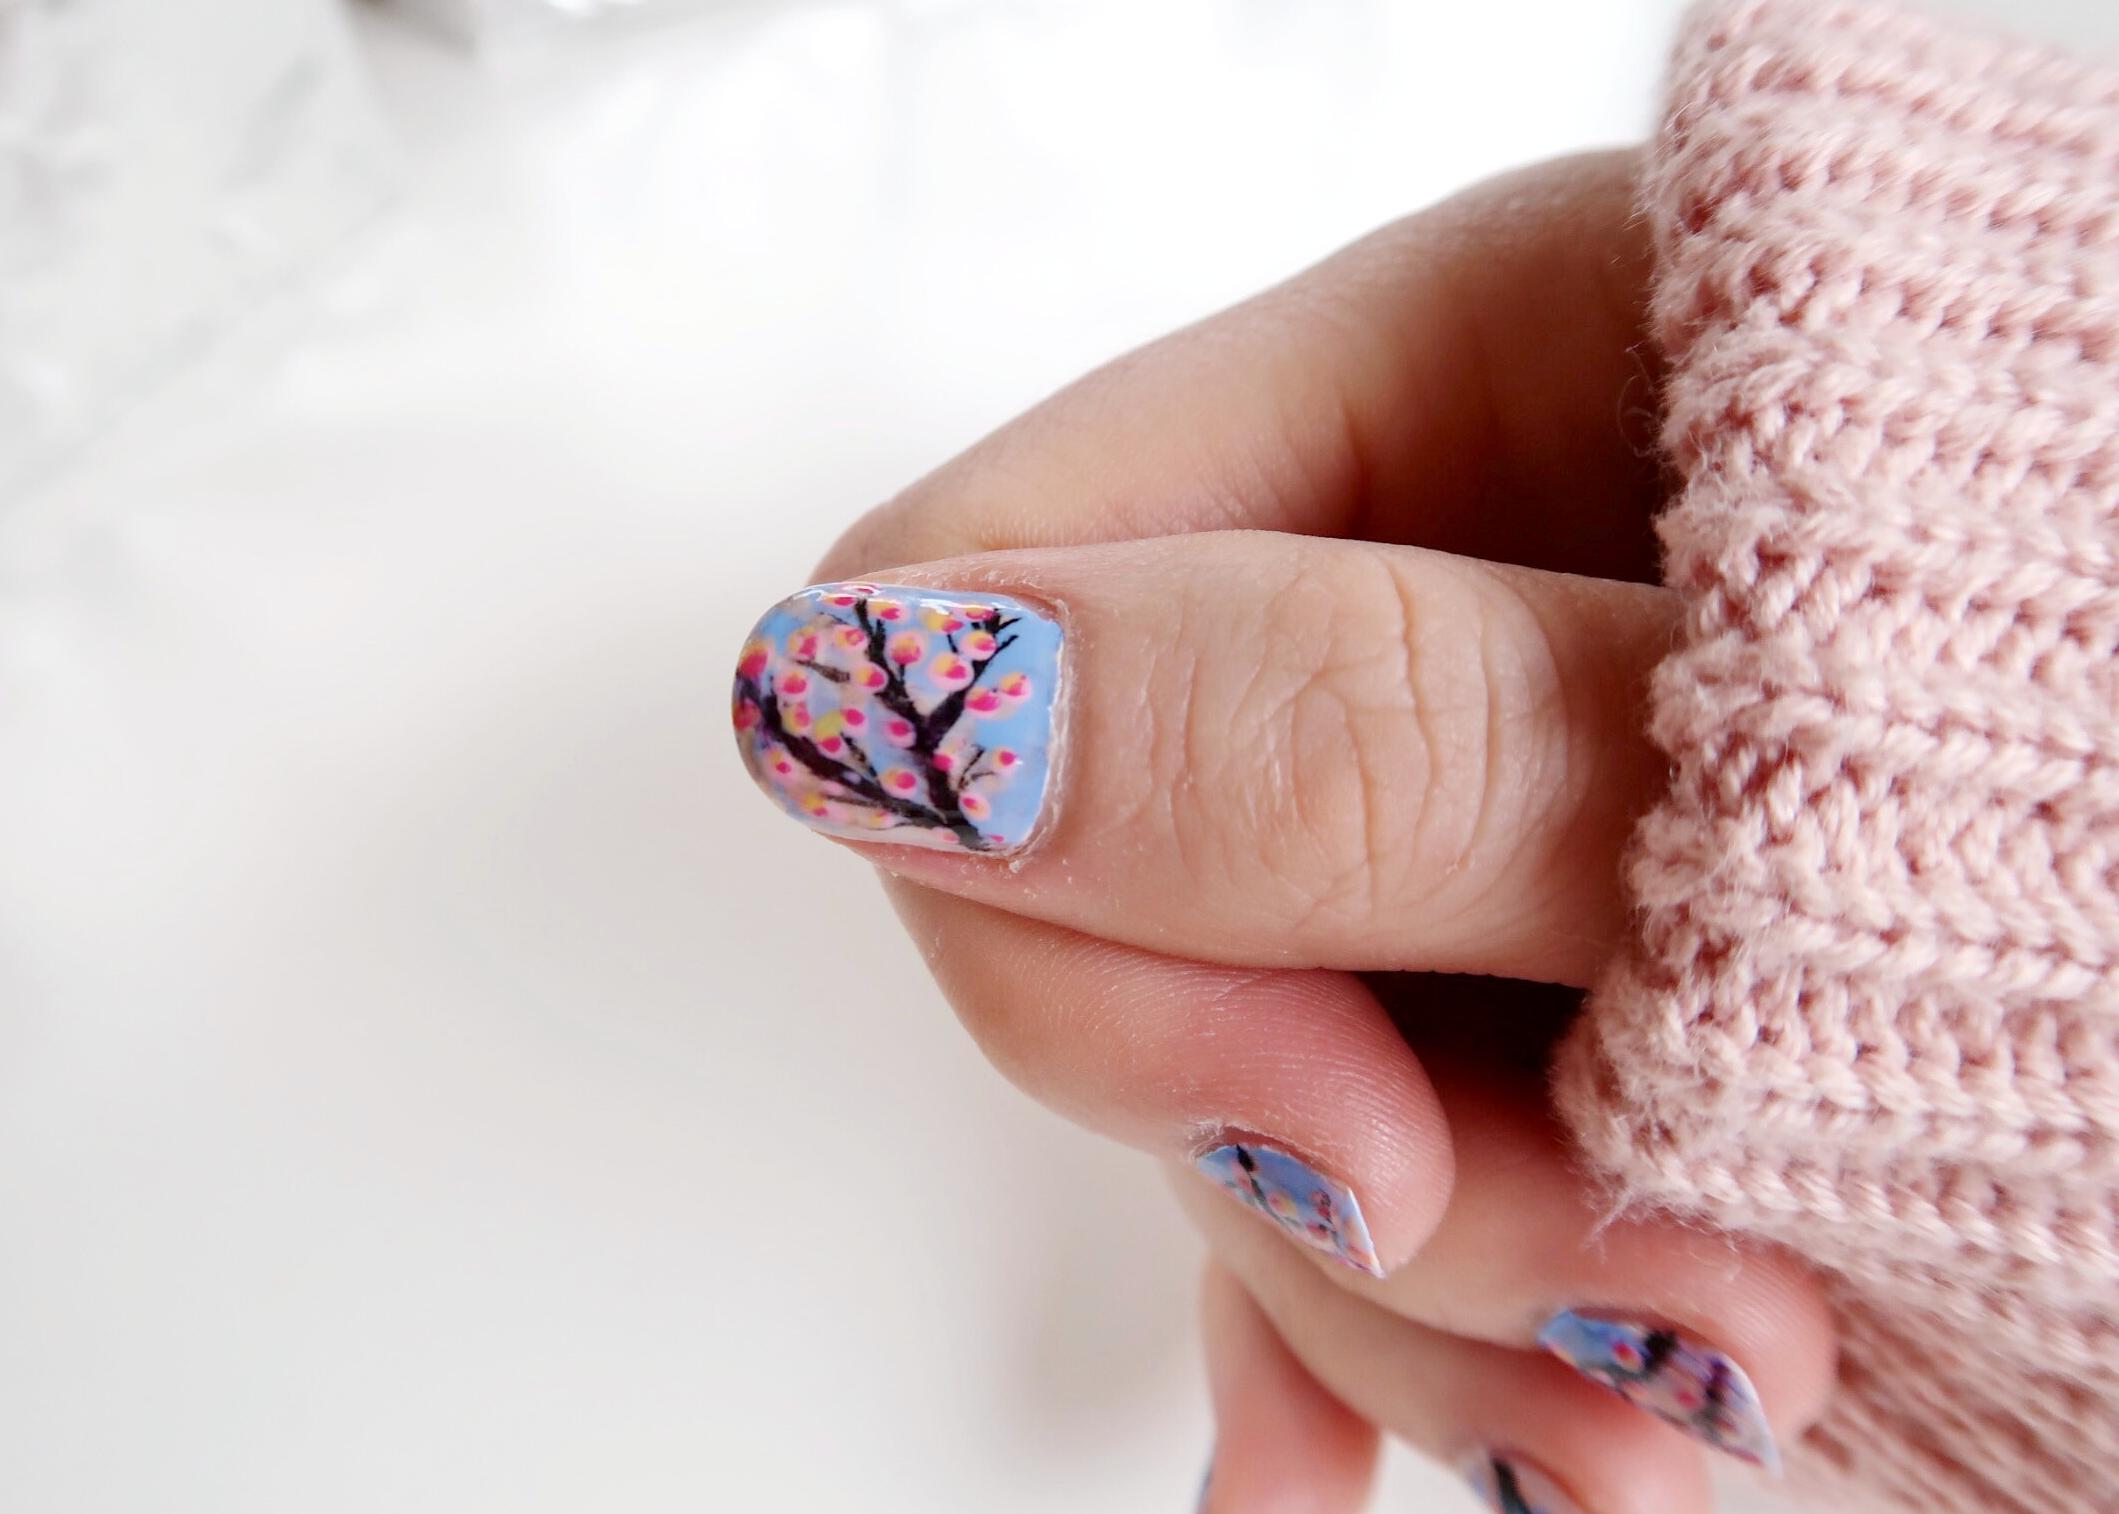 DIY Blossom Spring Nail Art by Isoscella